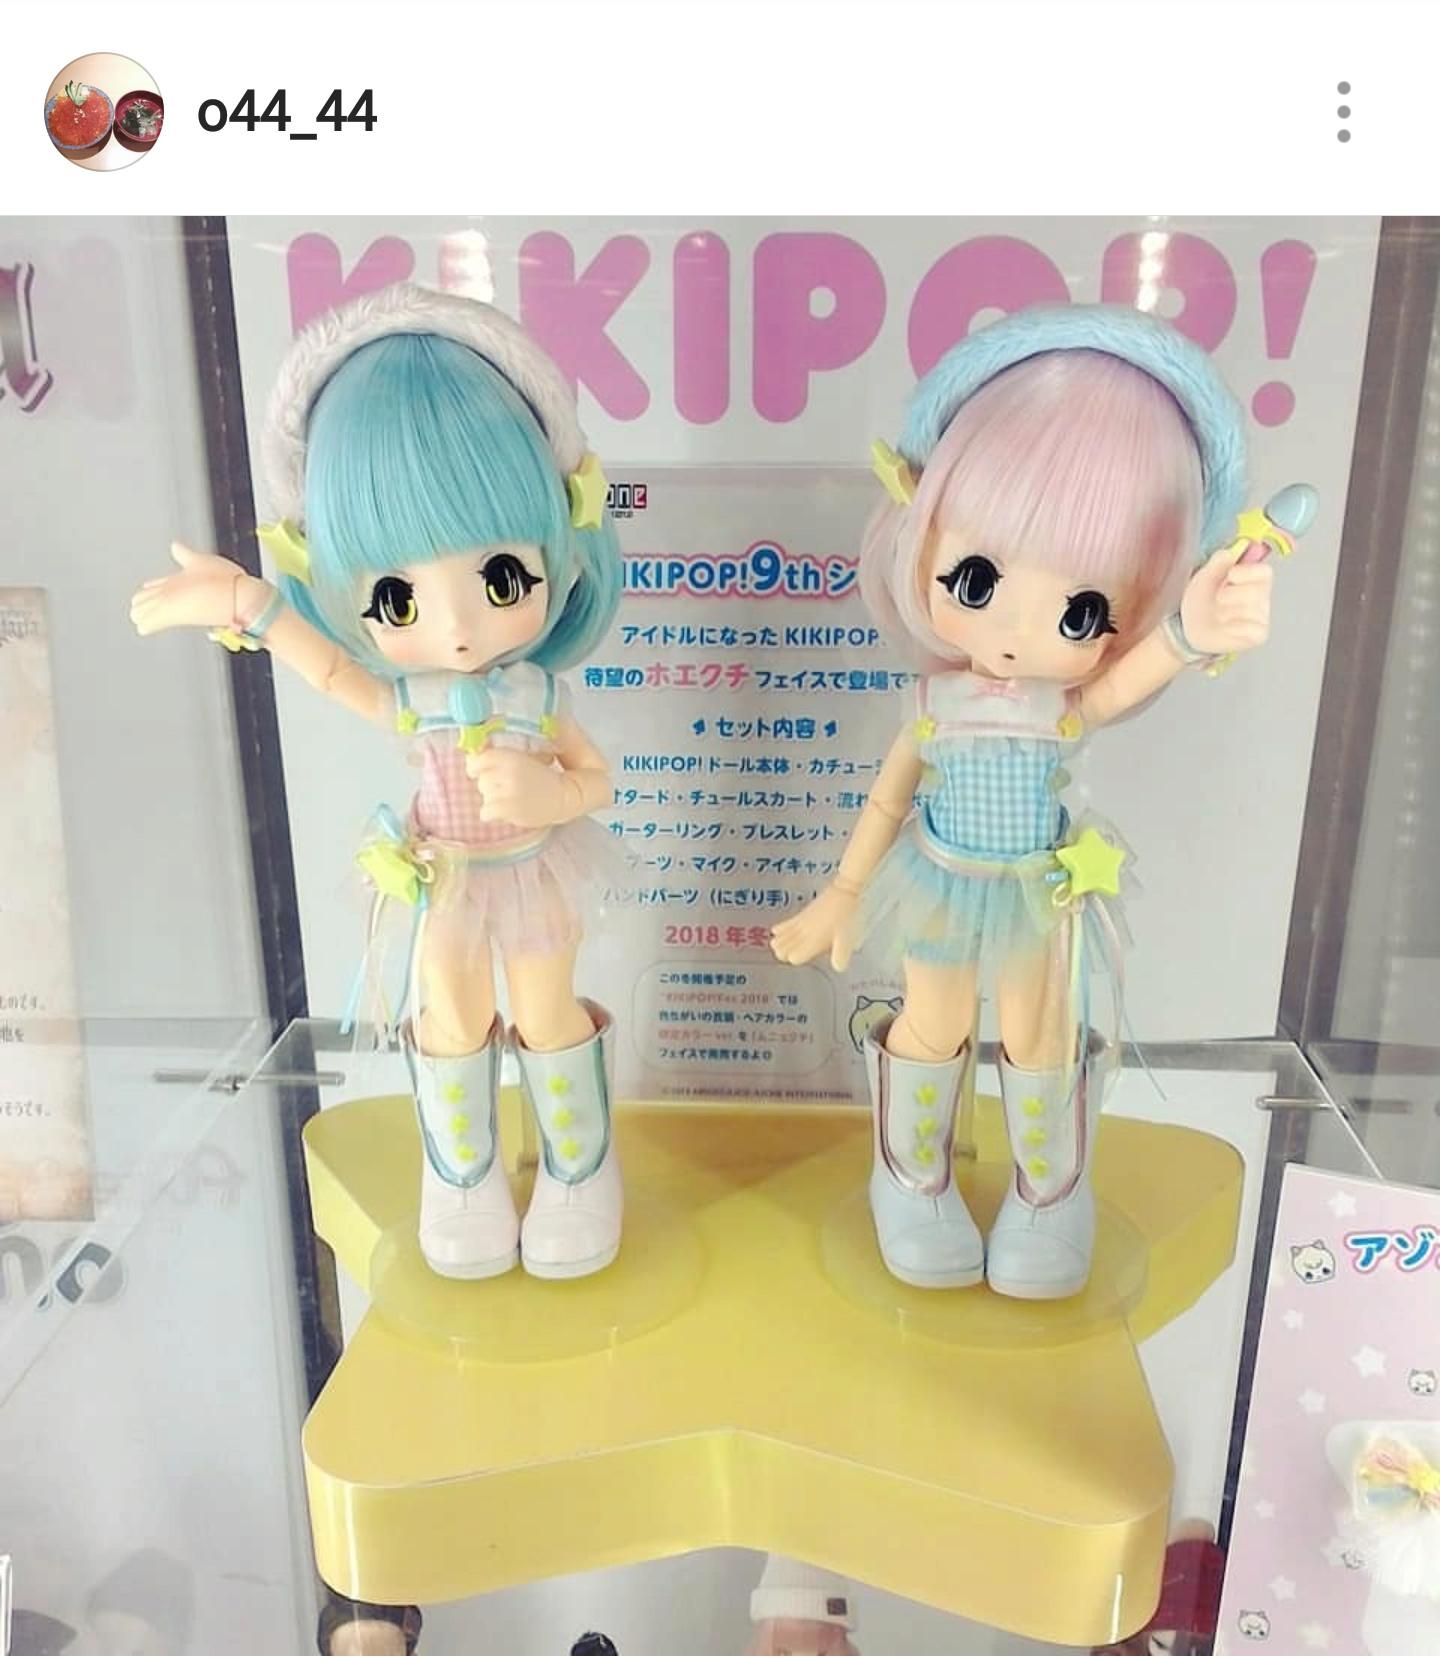 [Kikipop] Hoekuchi Pipipoppi Idol 20180910